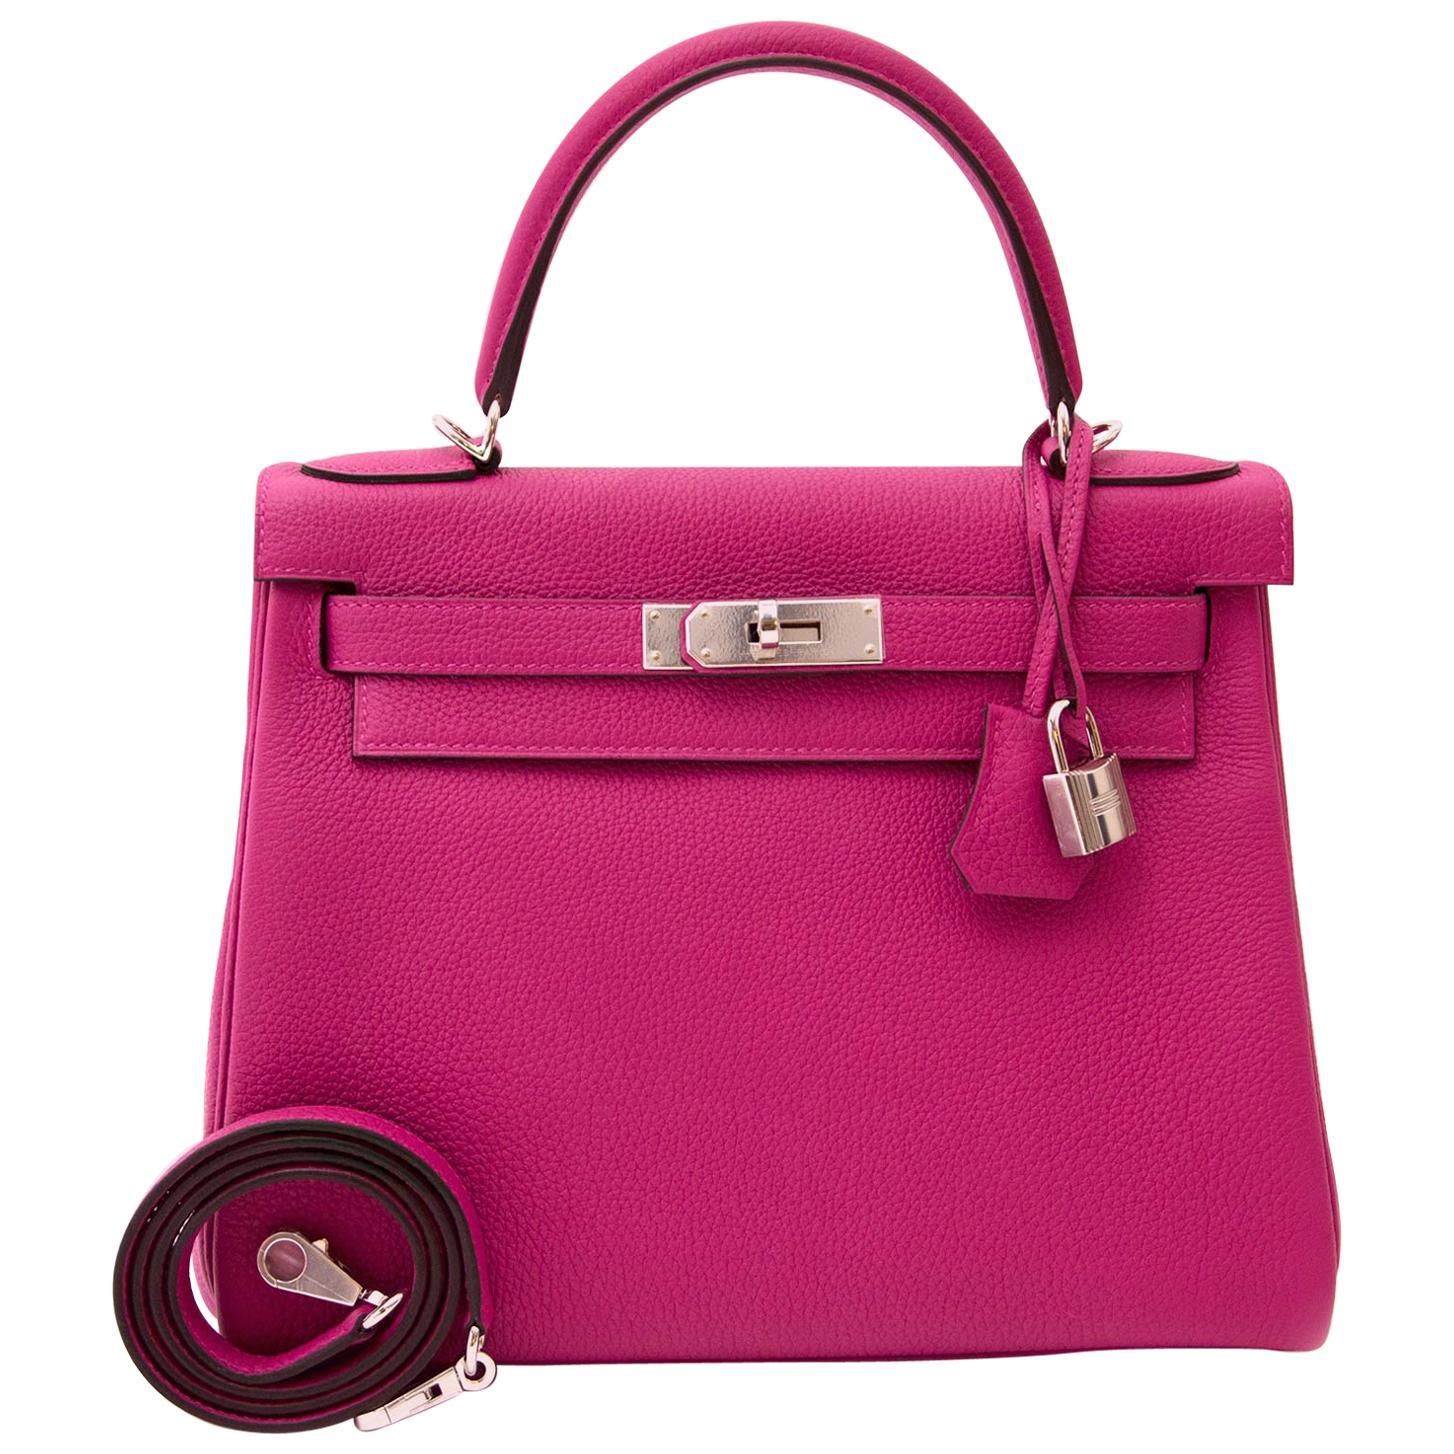 Hermès Kelly 28 Togo Pourpre PHW Bag